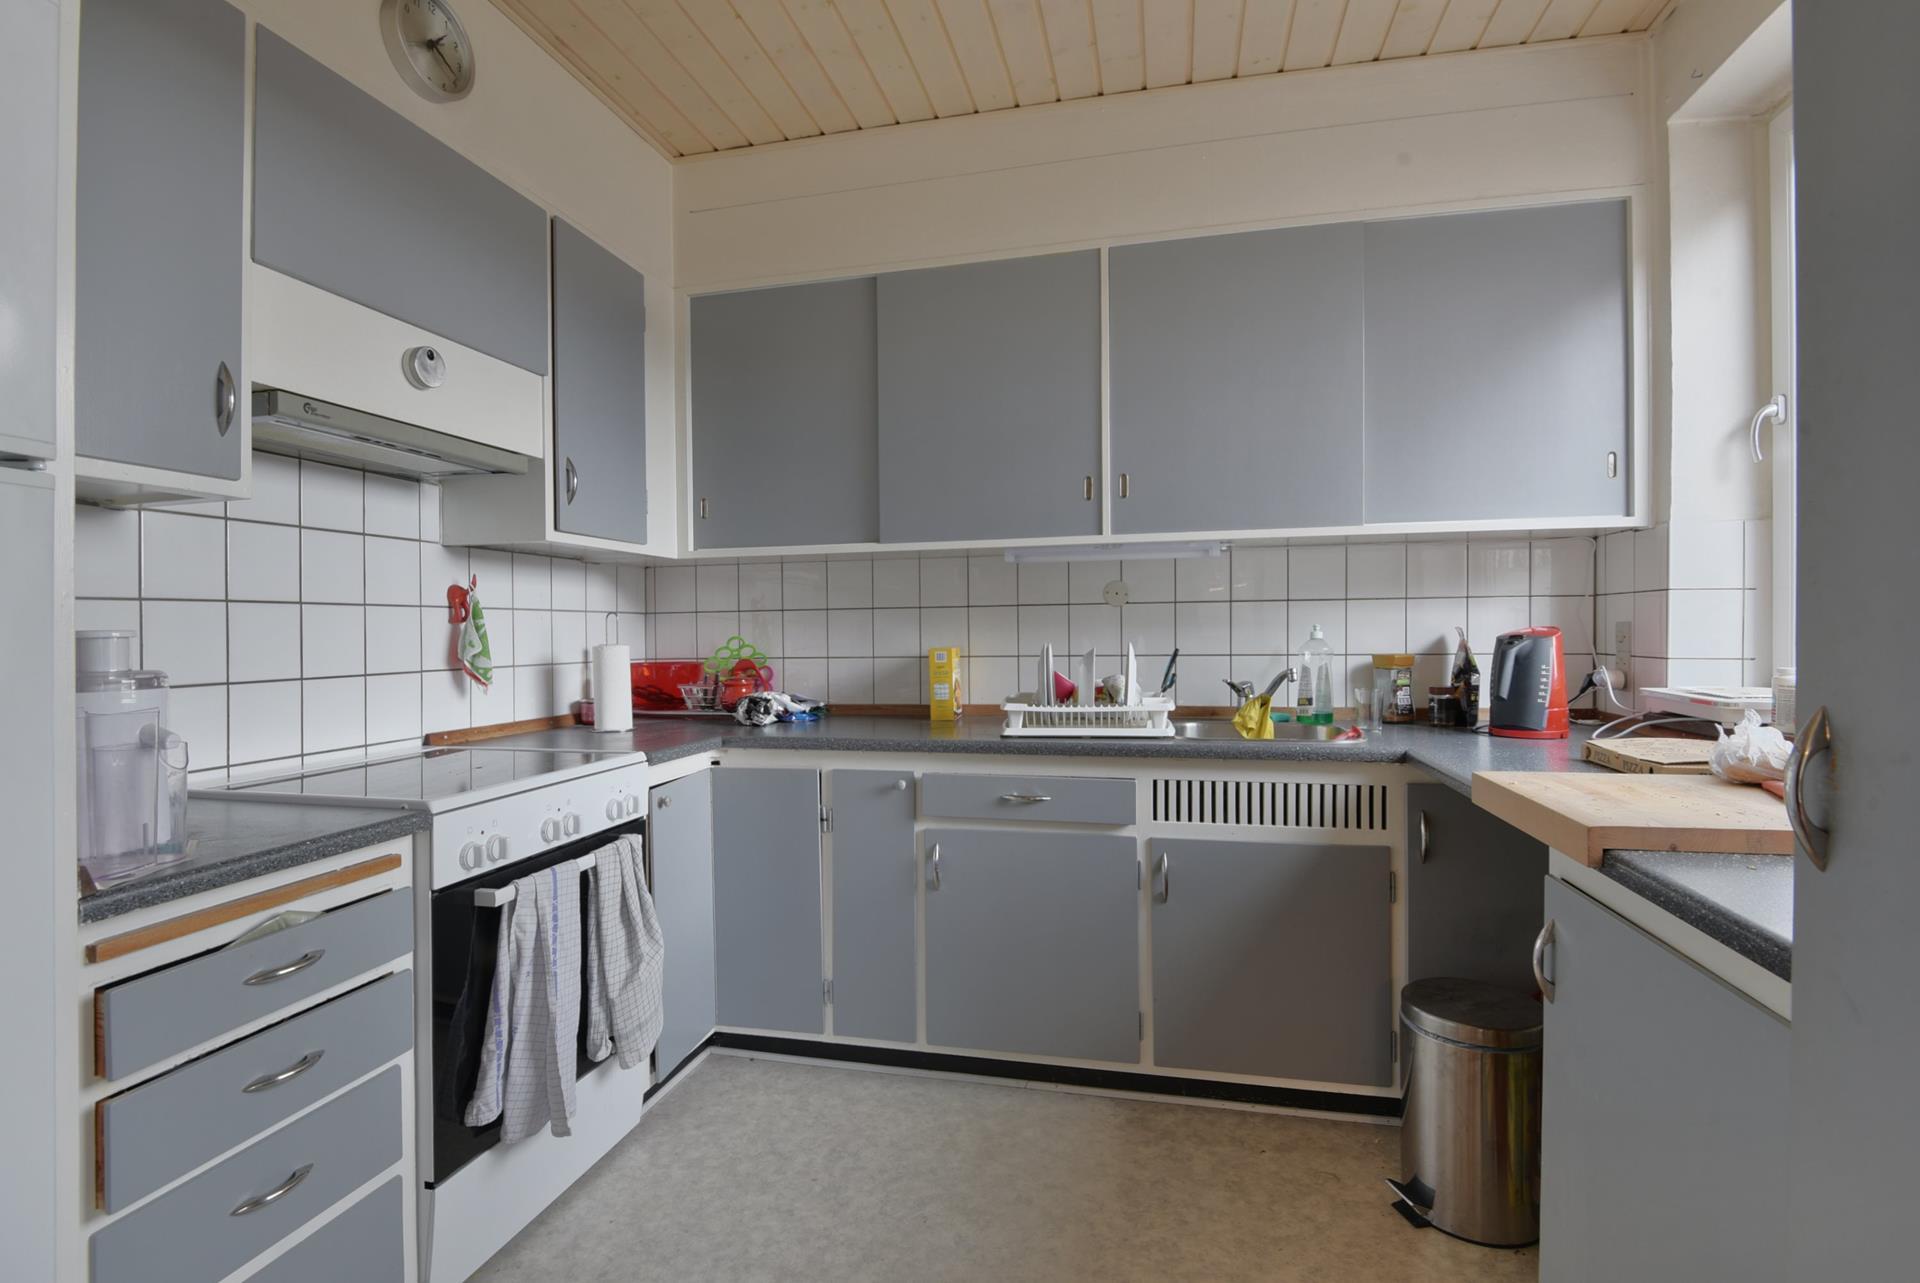 Bolig/erhverv på Nygade i Gråsten - Køkken